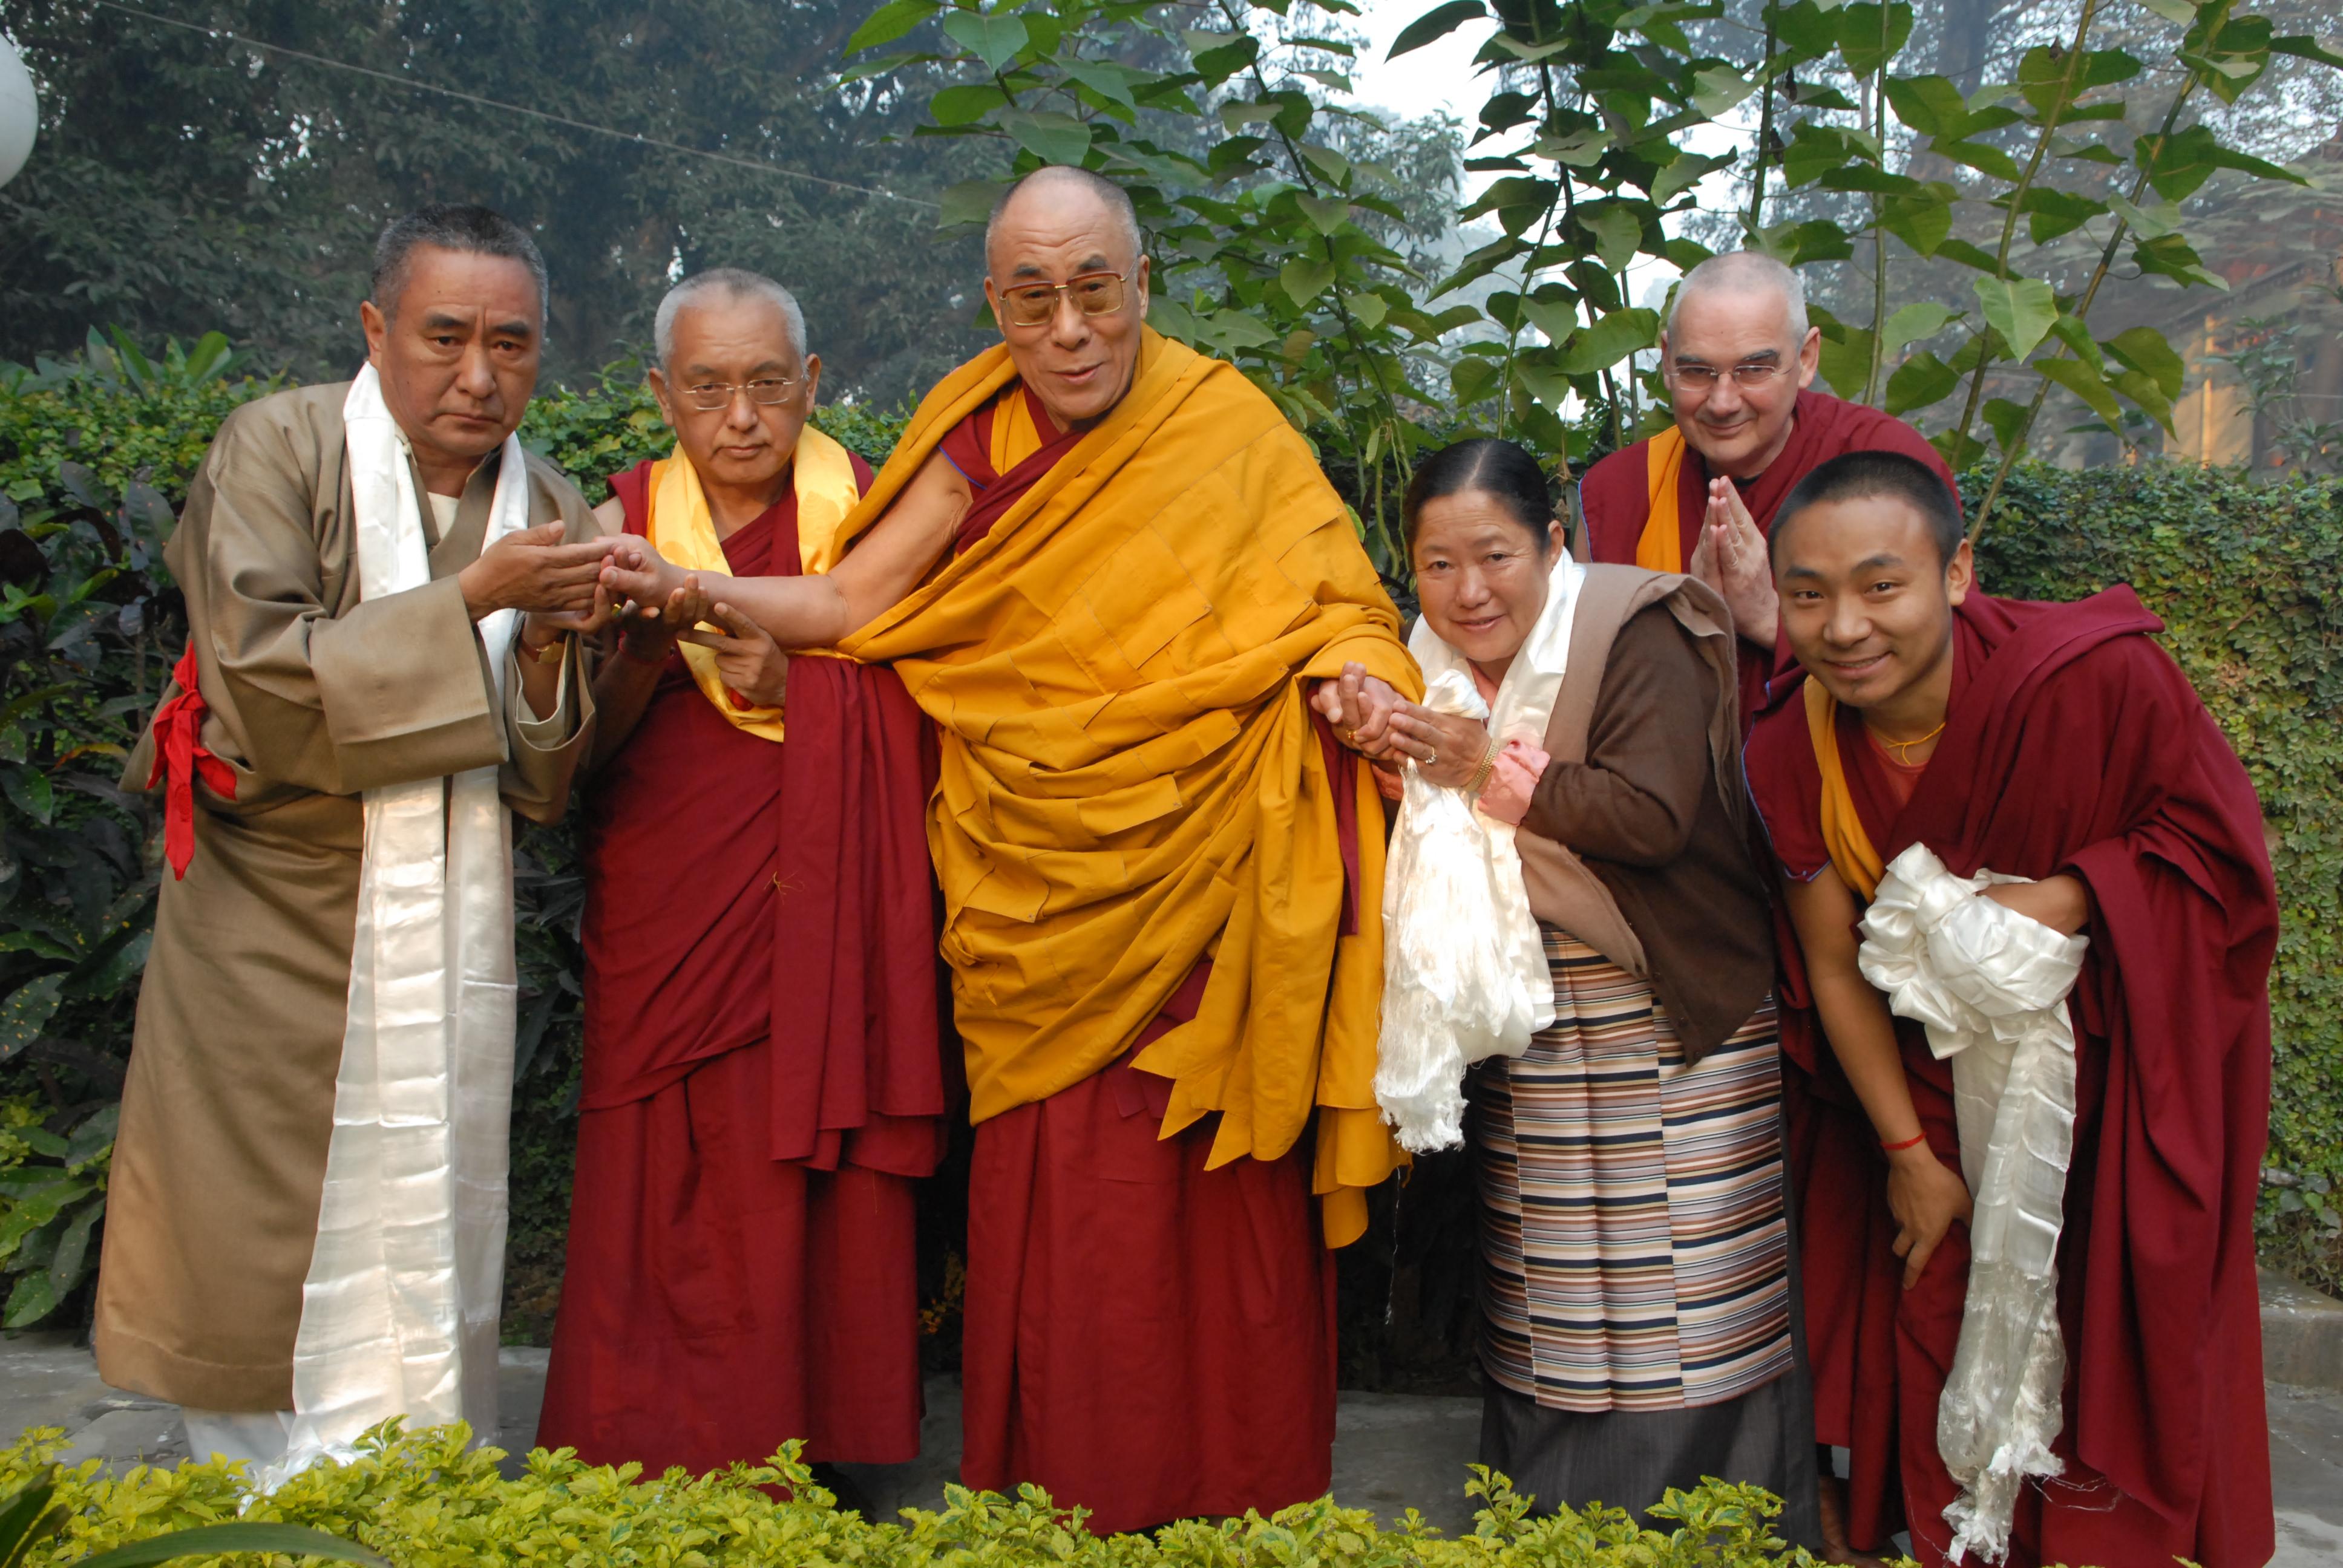 His Holiness the Dalai Lama and Lama Zopa Rinpoche in Sarnath, India, 2009. Photo: Office of His Holiness the Dalai Lama.